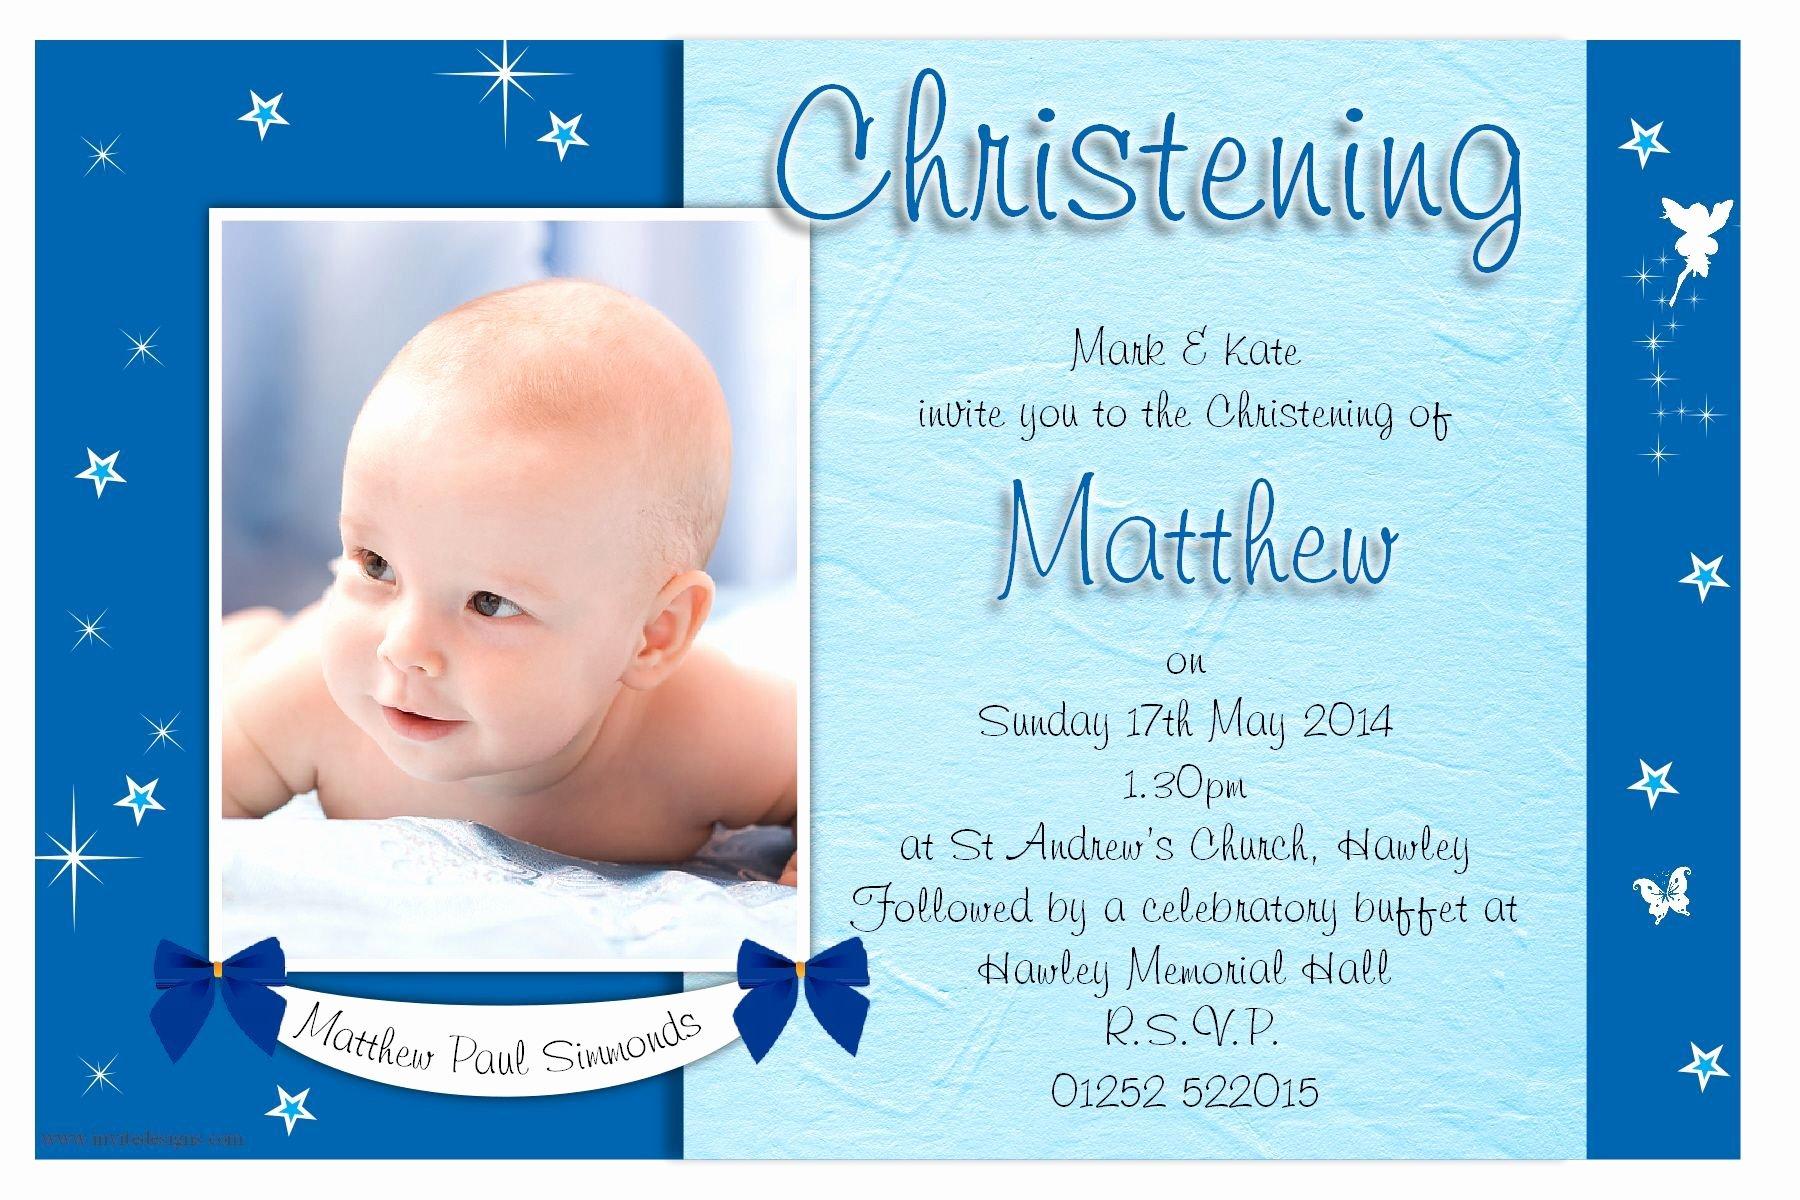 Free Baptism Invitation Templates Lovely Free Christening Invitation Template Printable